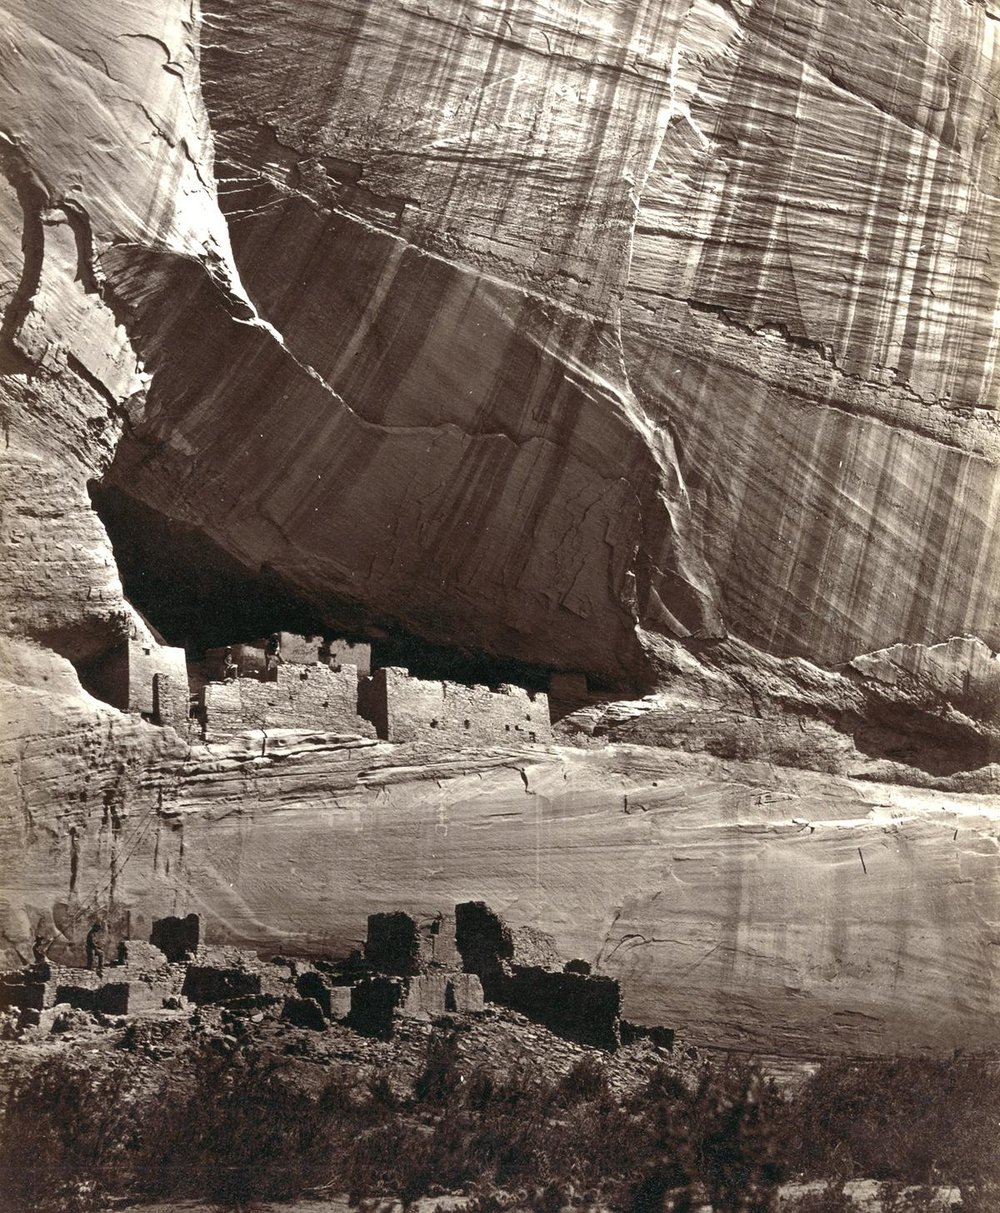 Anasazi ruins in Canyon de Chelly, Arizona, America in 1873.